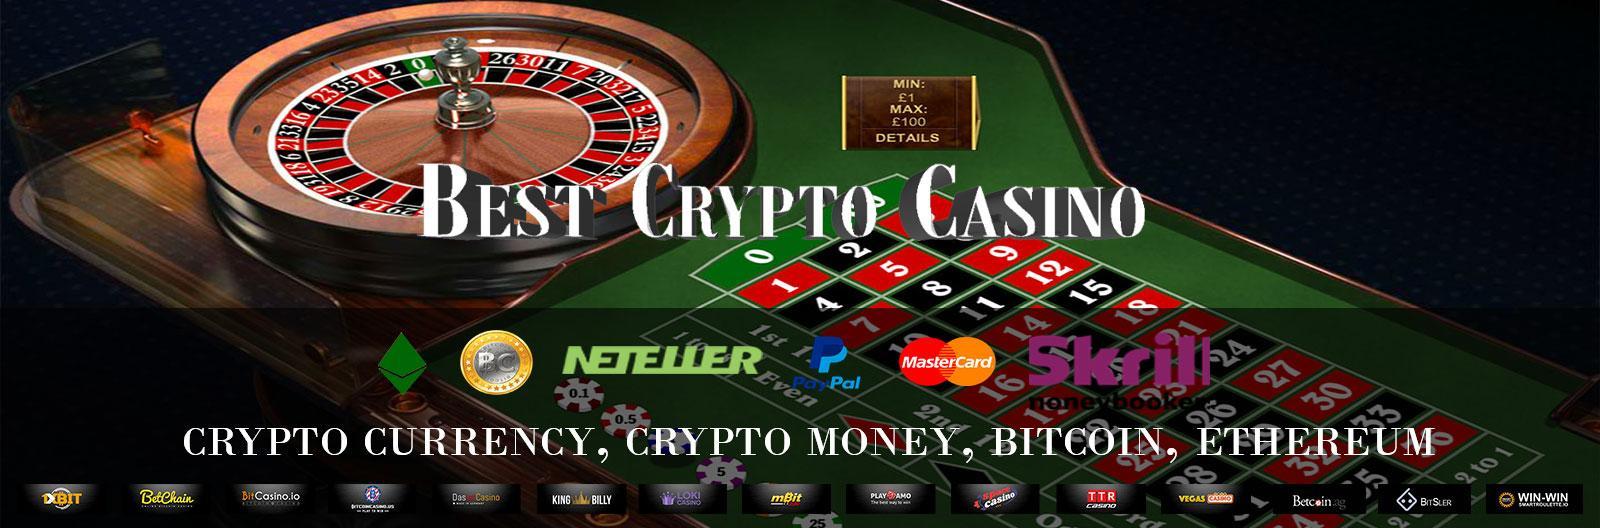 Real money casino on ipad